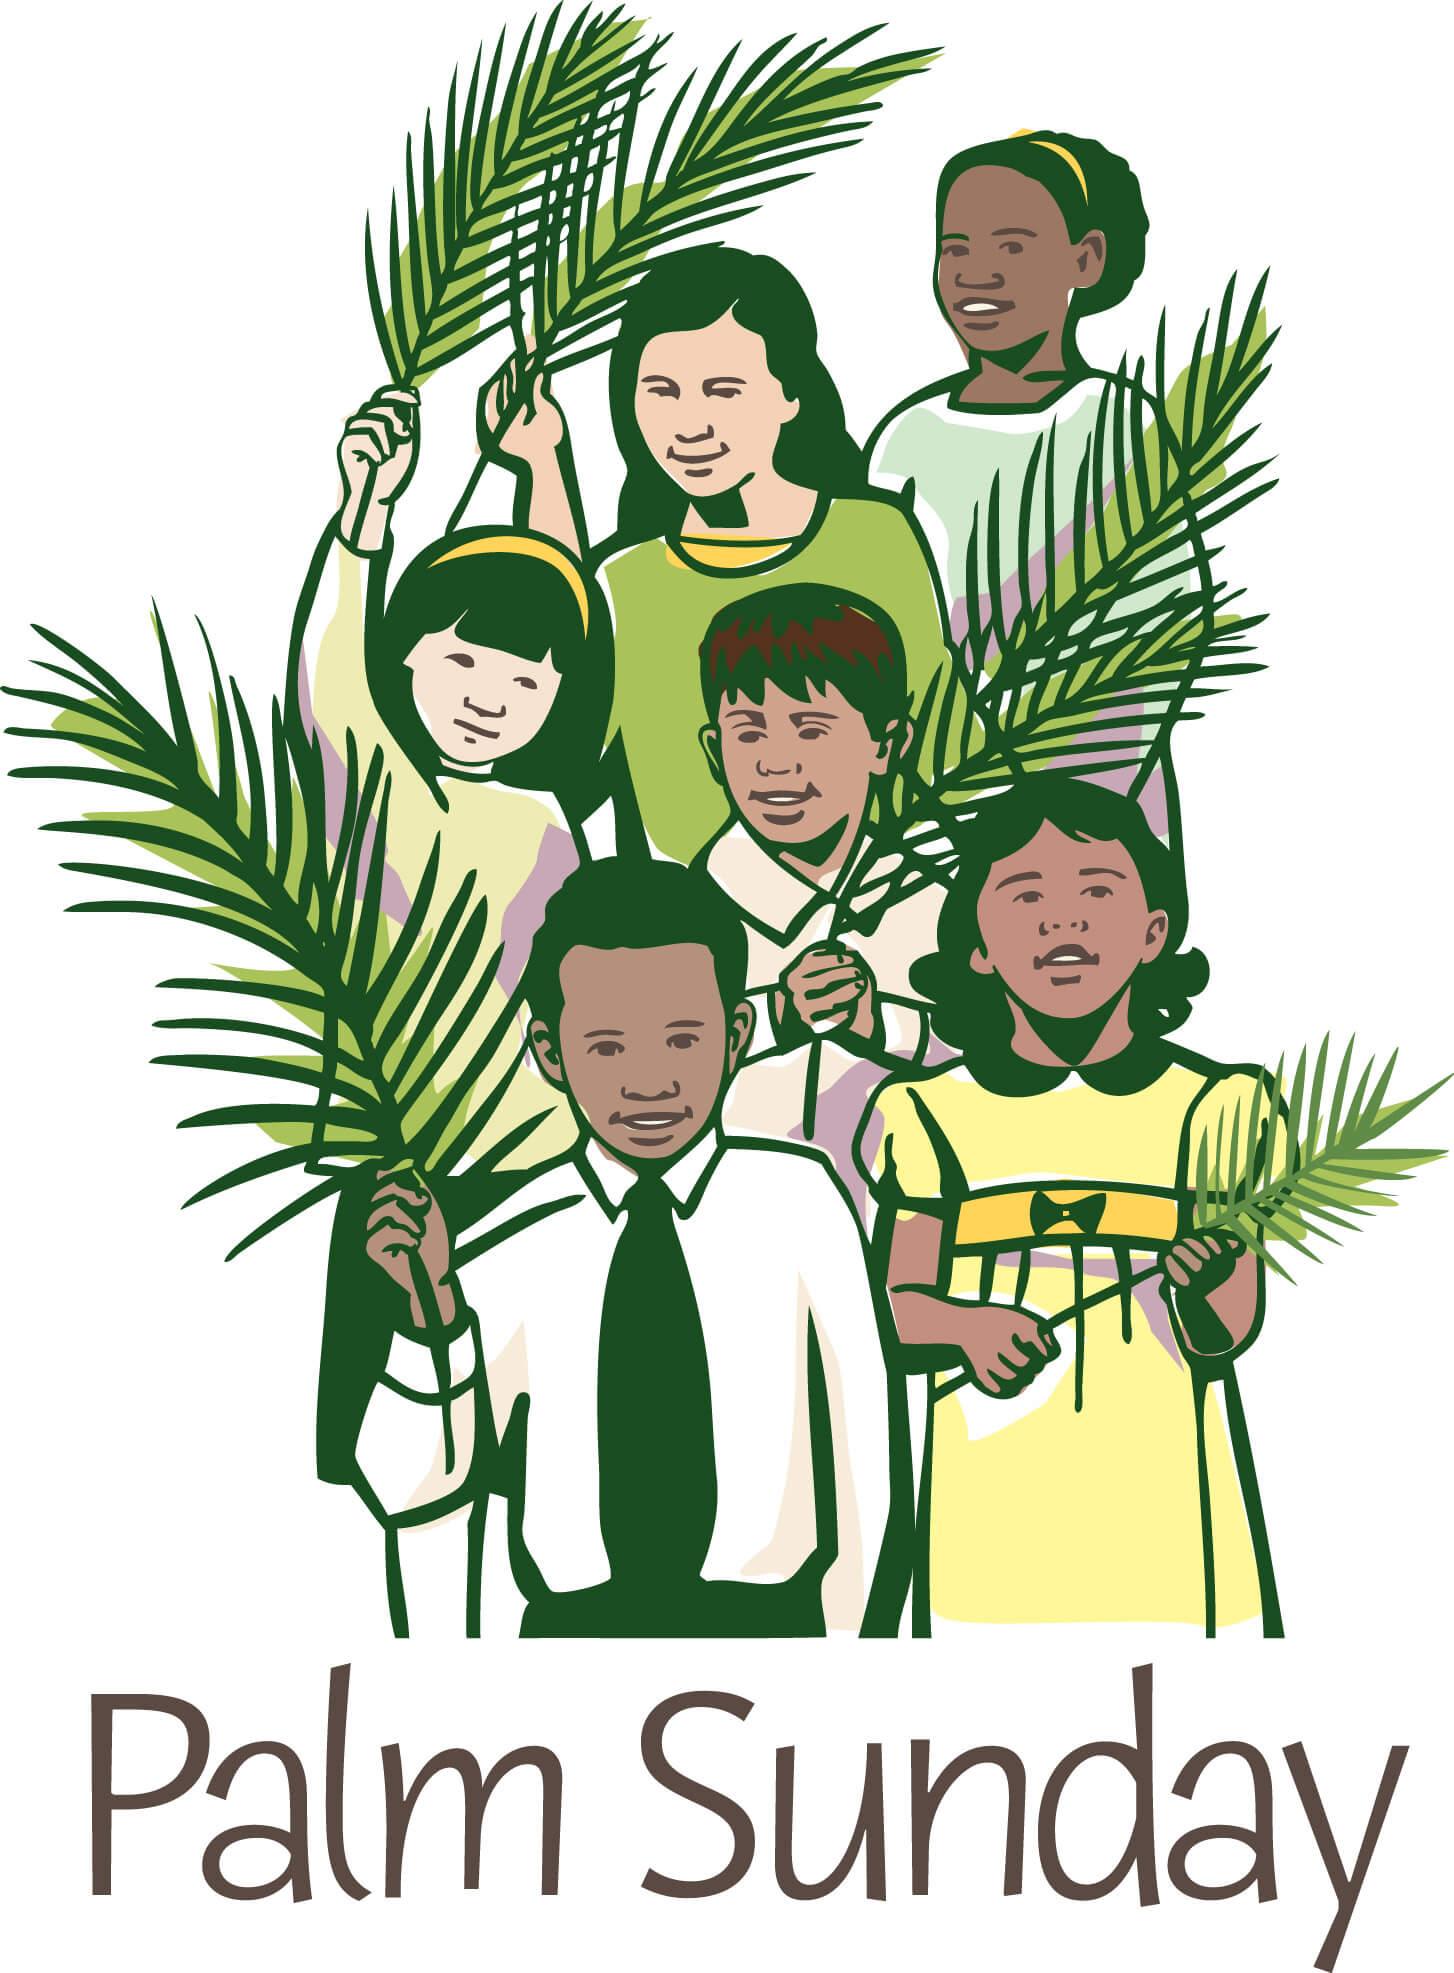 palm sunday free desktop image